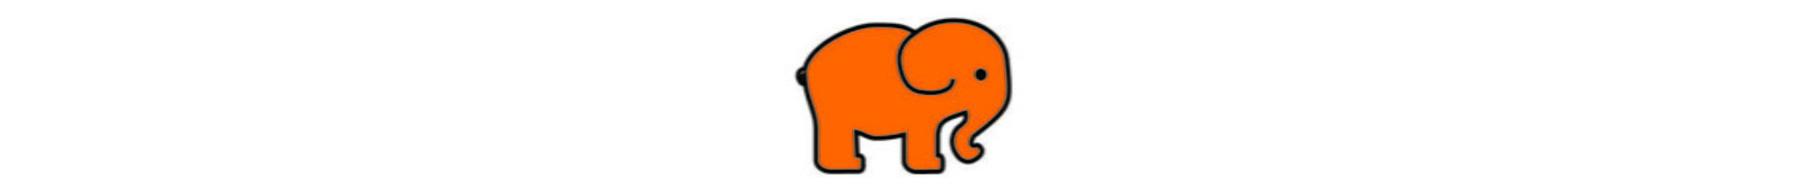 Elefante Laranja